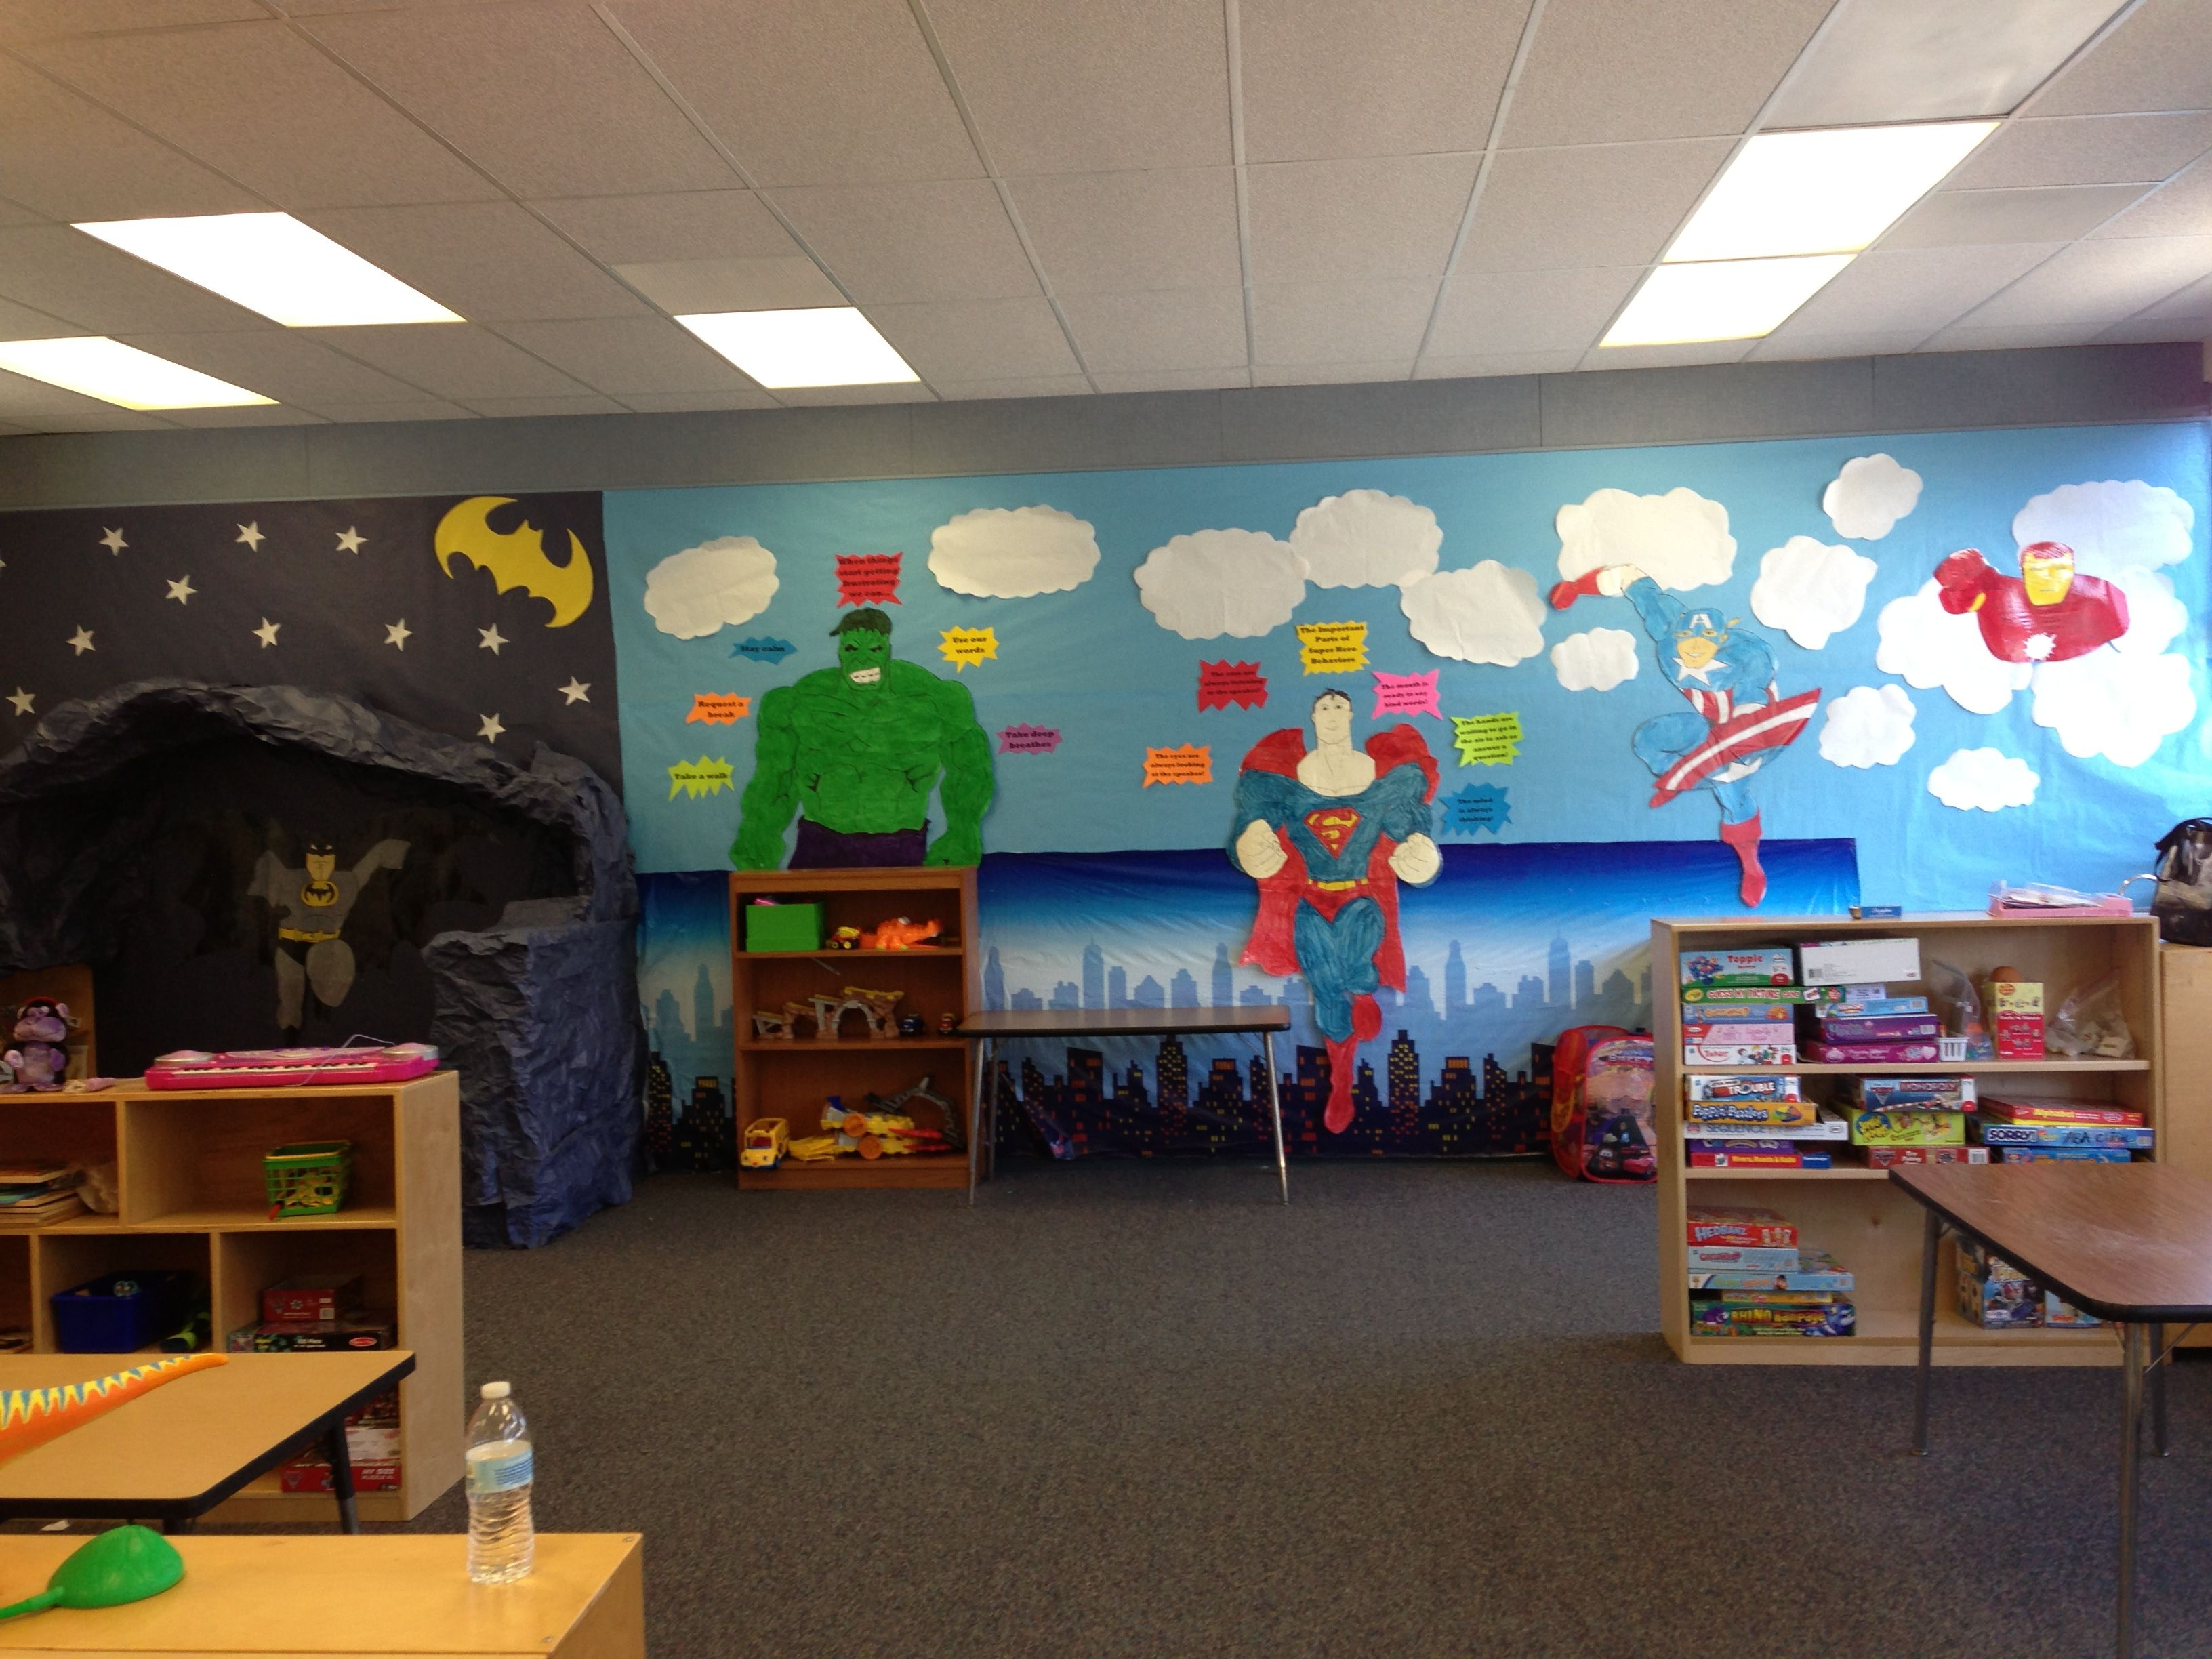 Elementary Super Hero Classroom Ideas ~ Superhero classroom theme pictures to pin on pinterest